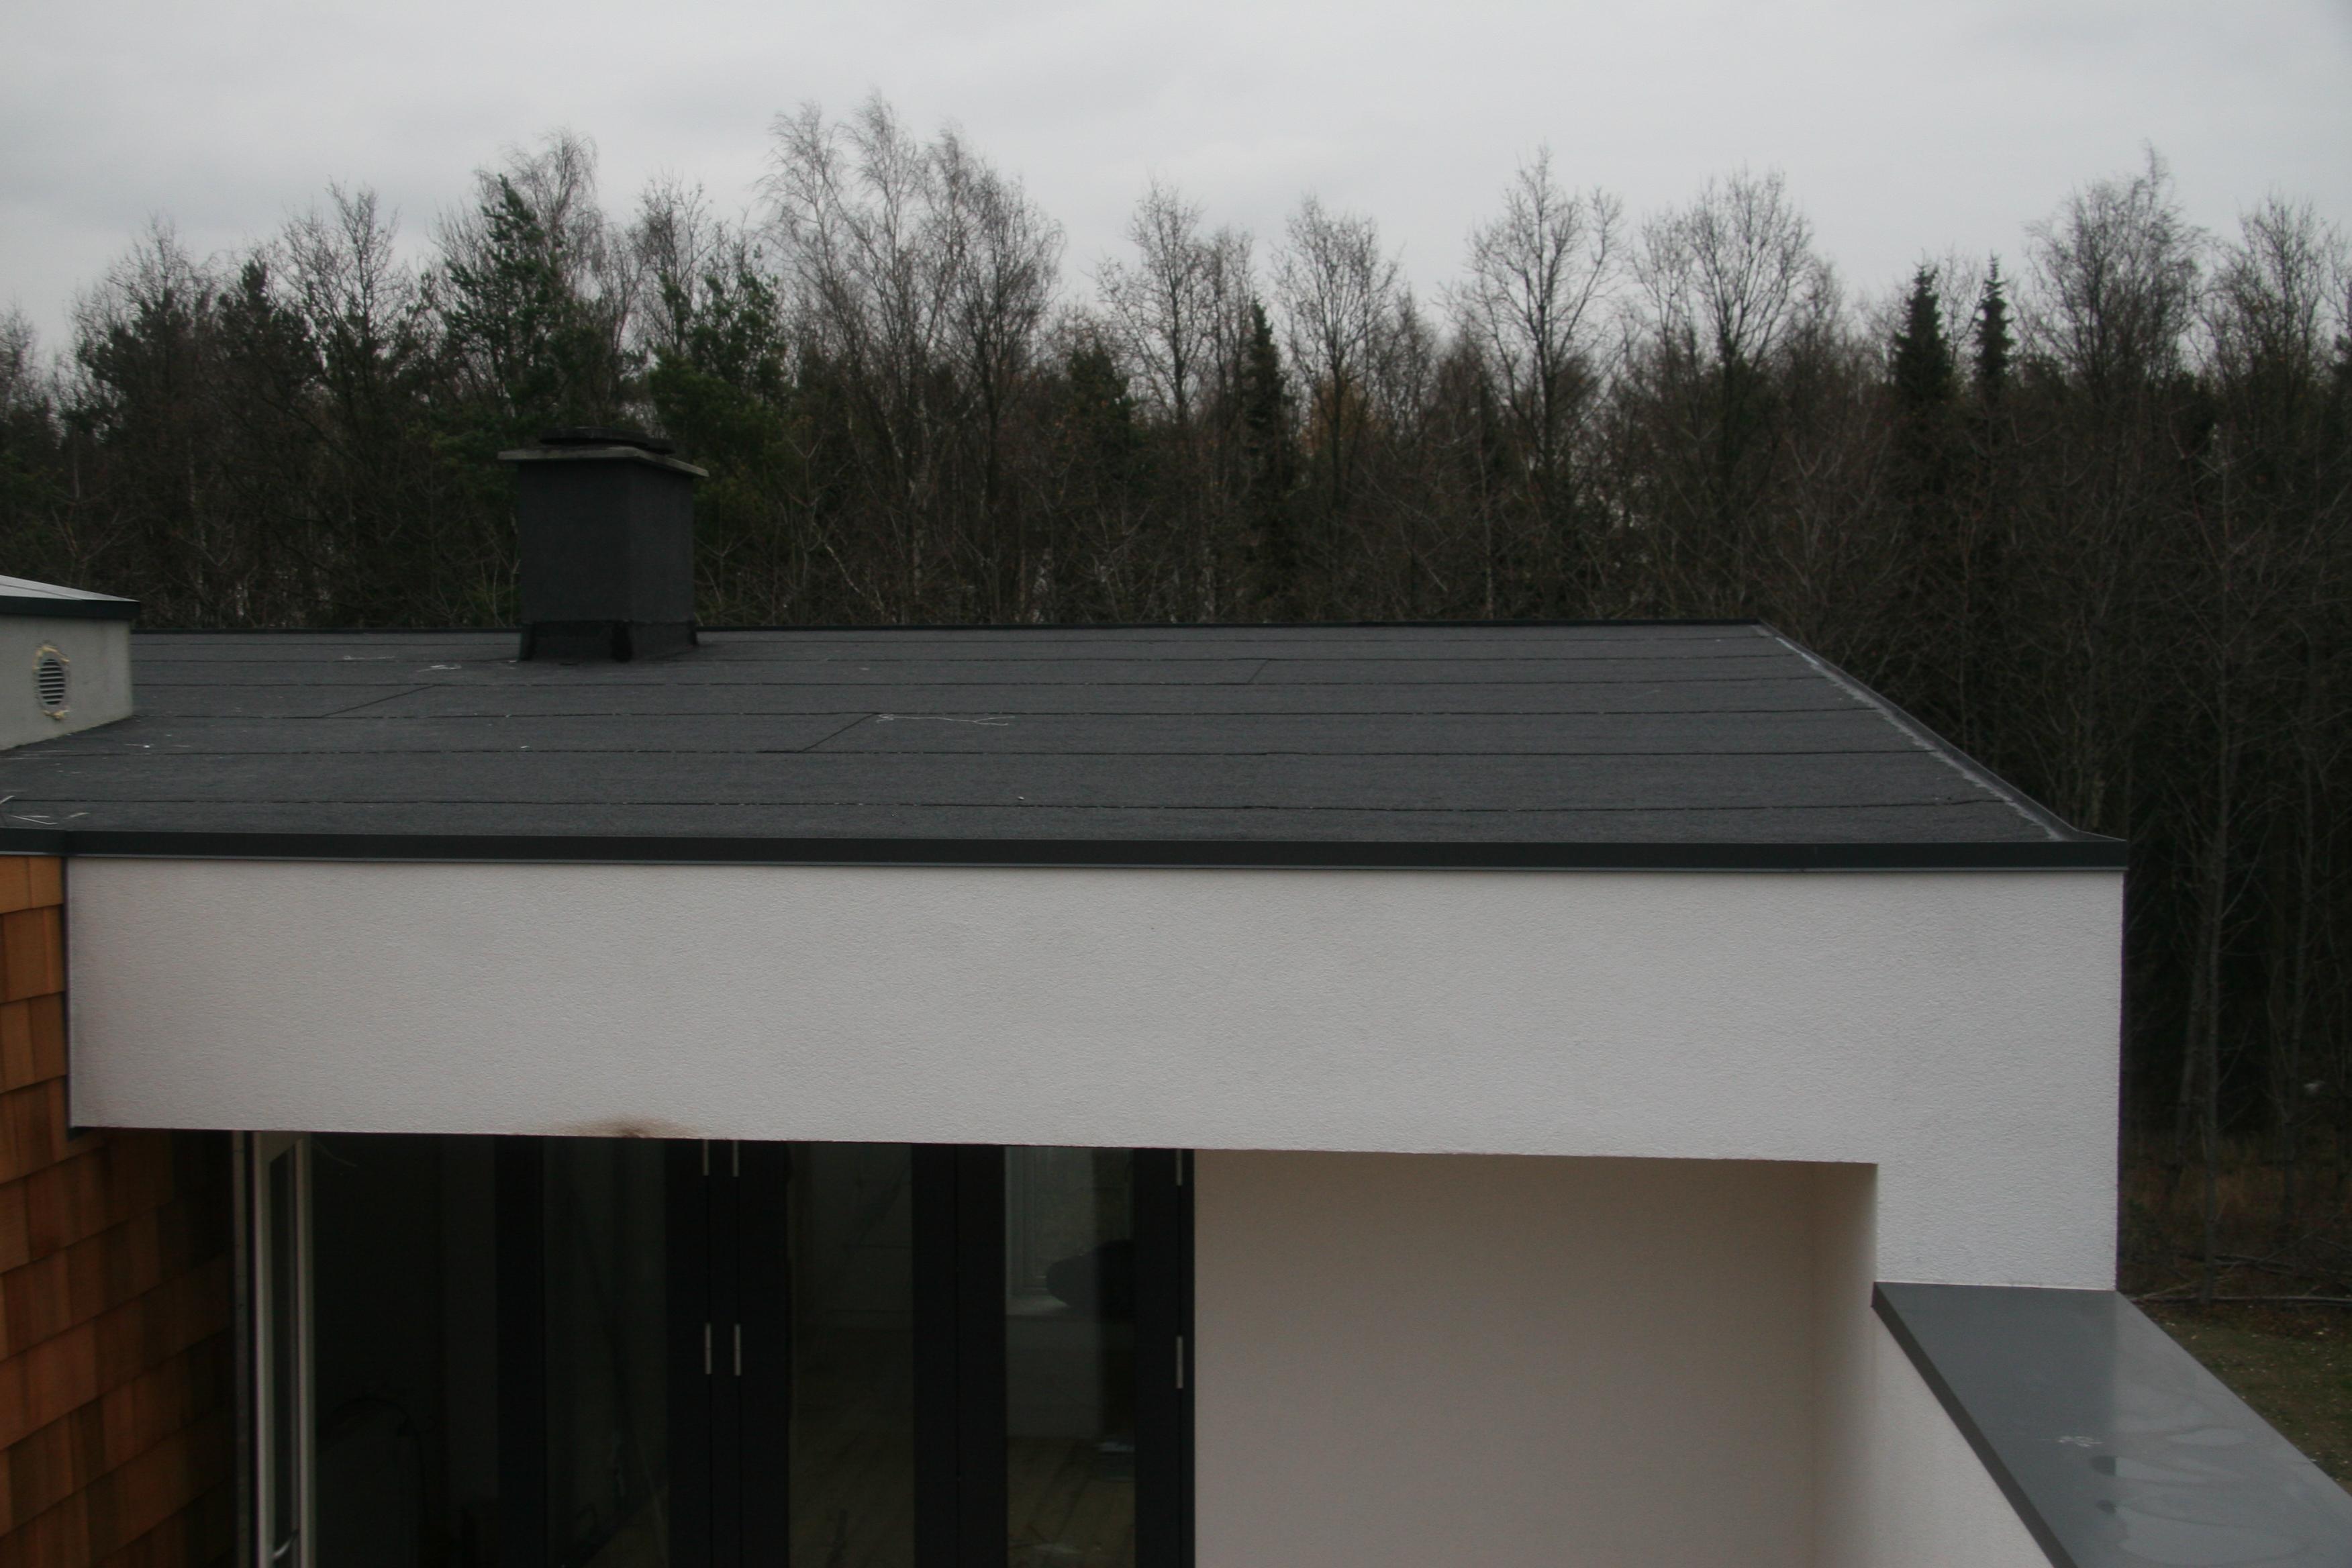 bozel-Lavenergihus-Tage-0013